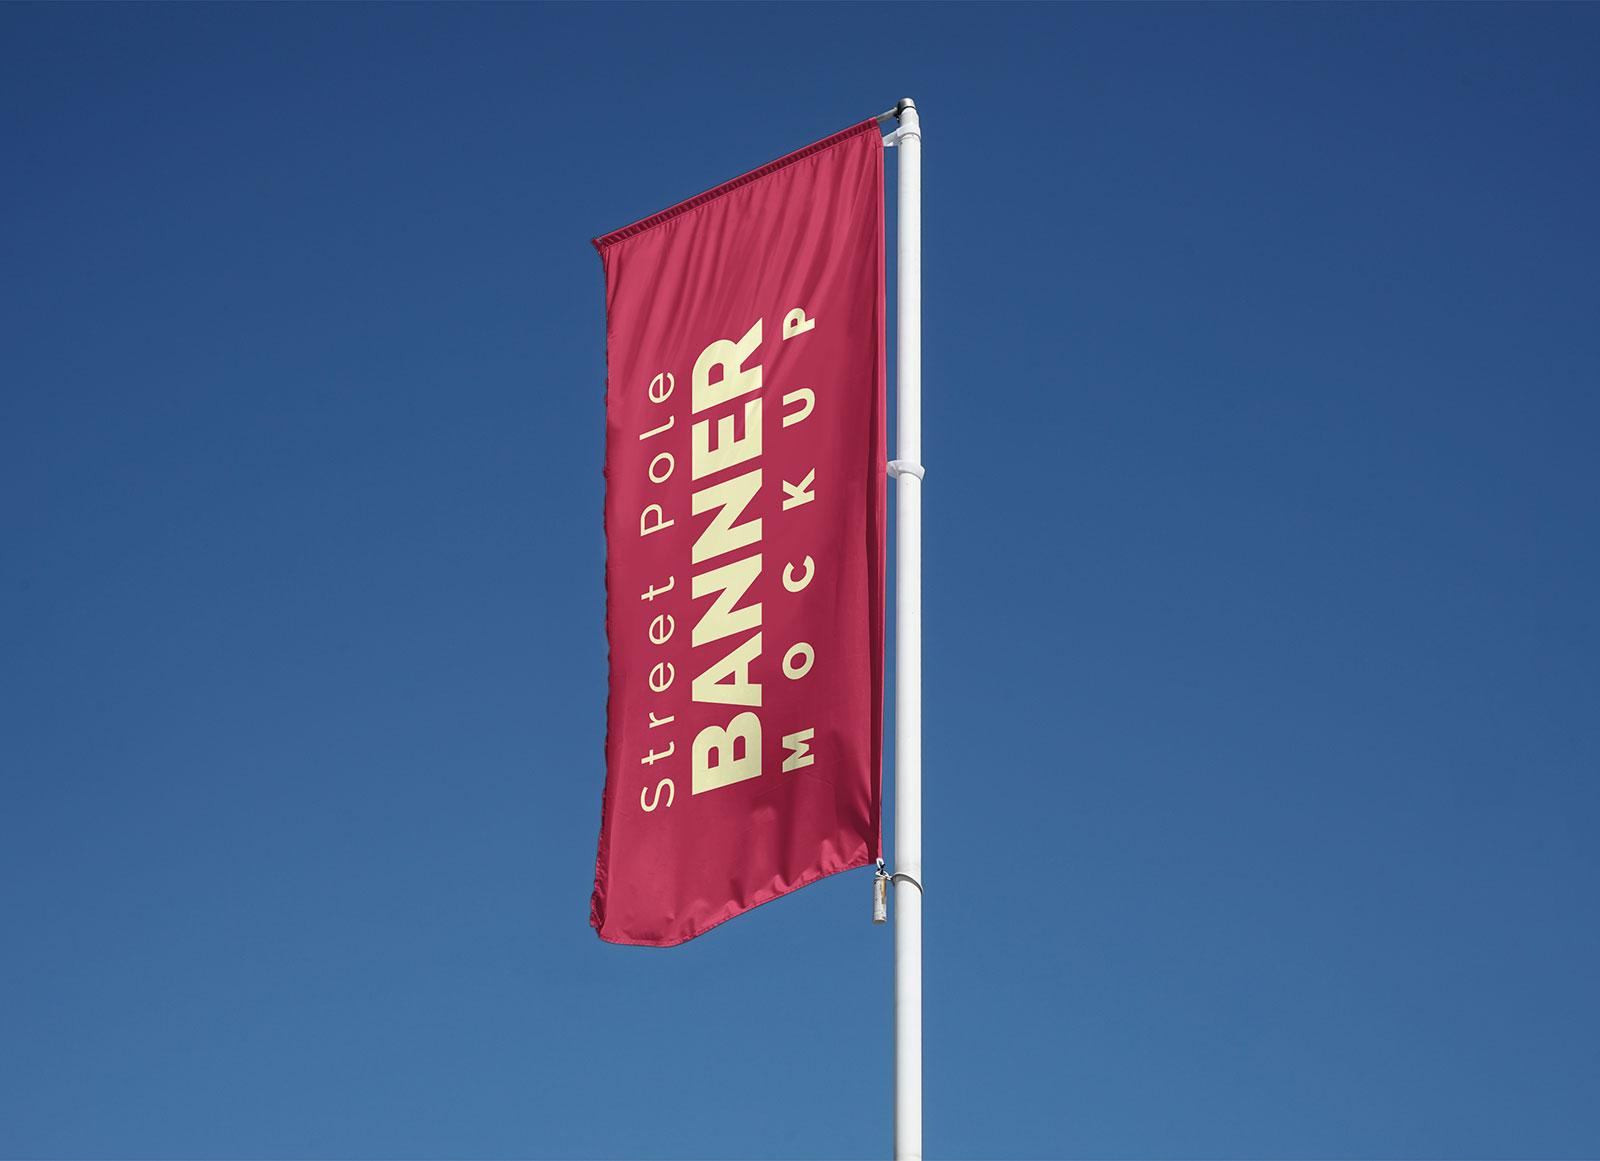 Free-Outdoor-Street-Pole-Banner-Flag-Mockup-PSD